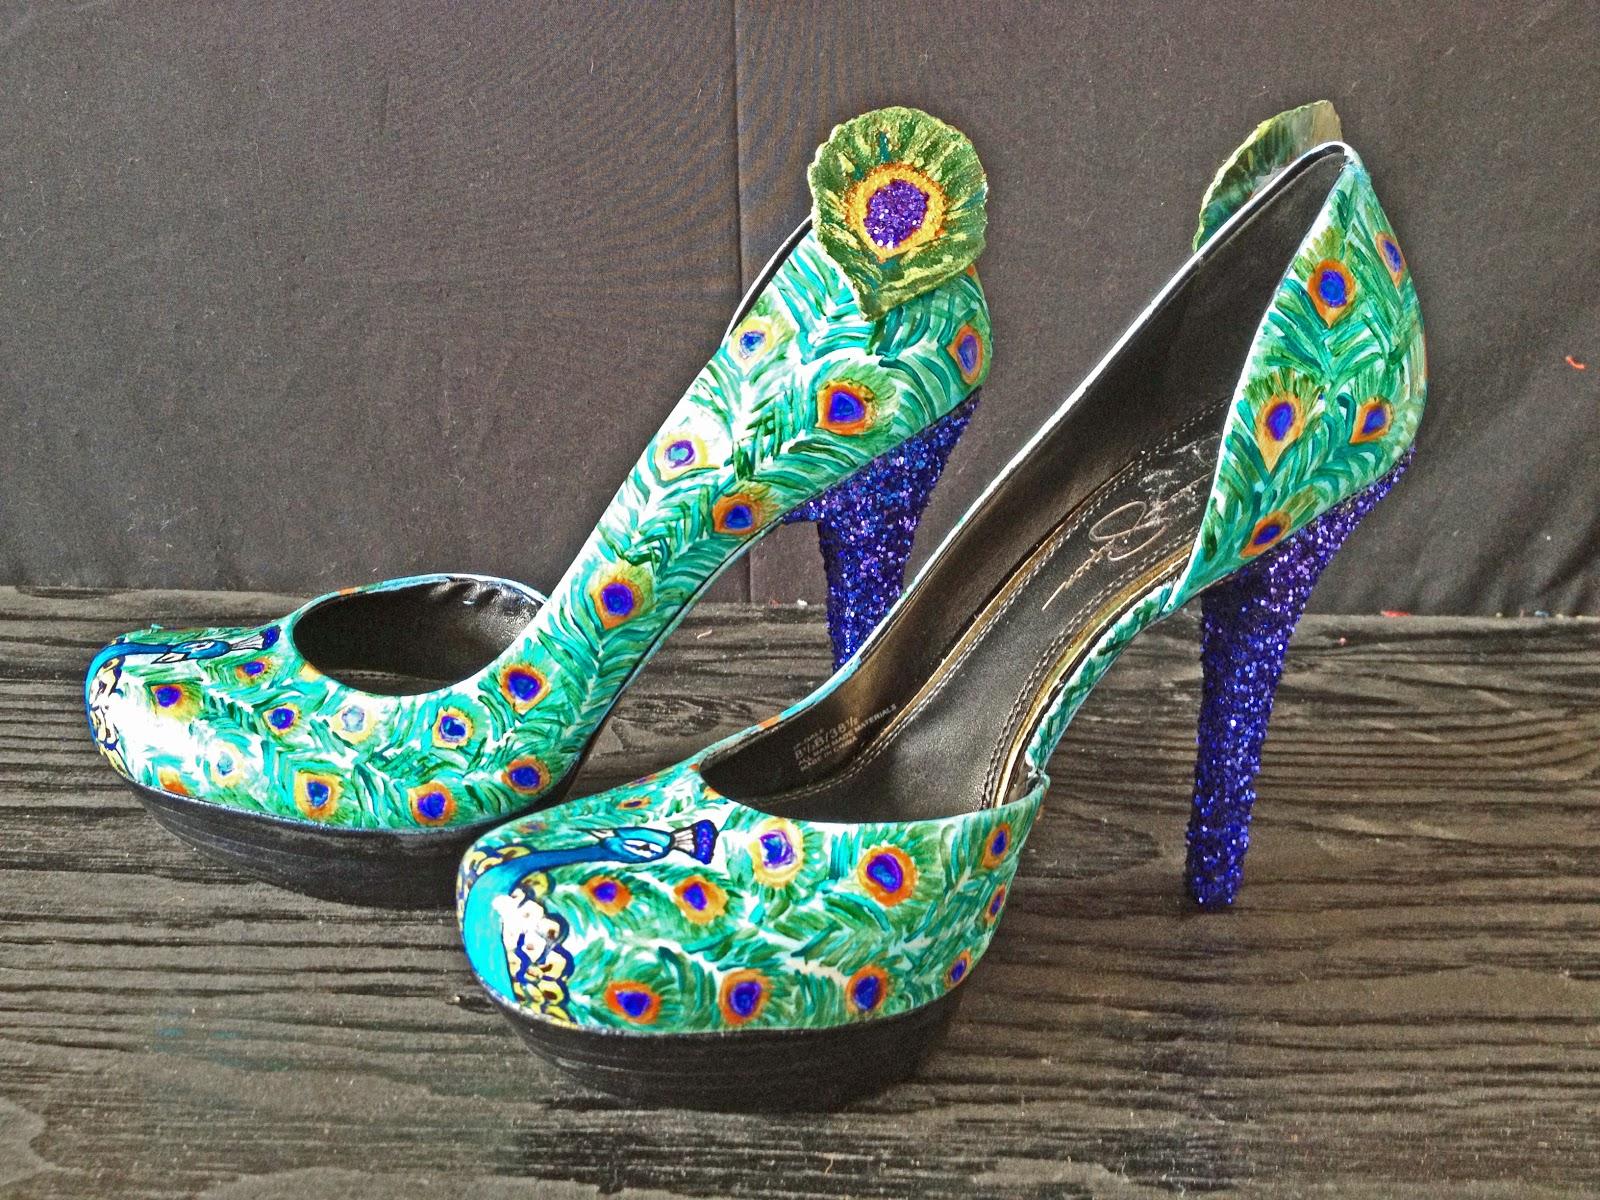 kick off your heels: Kick Off Your Heels with Peacock High ...